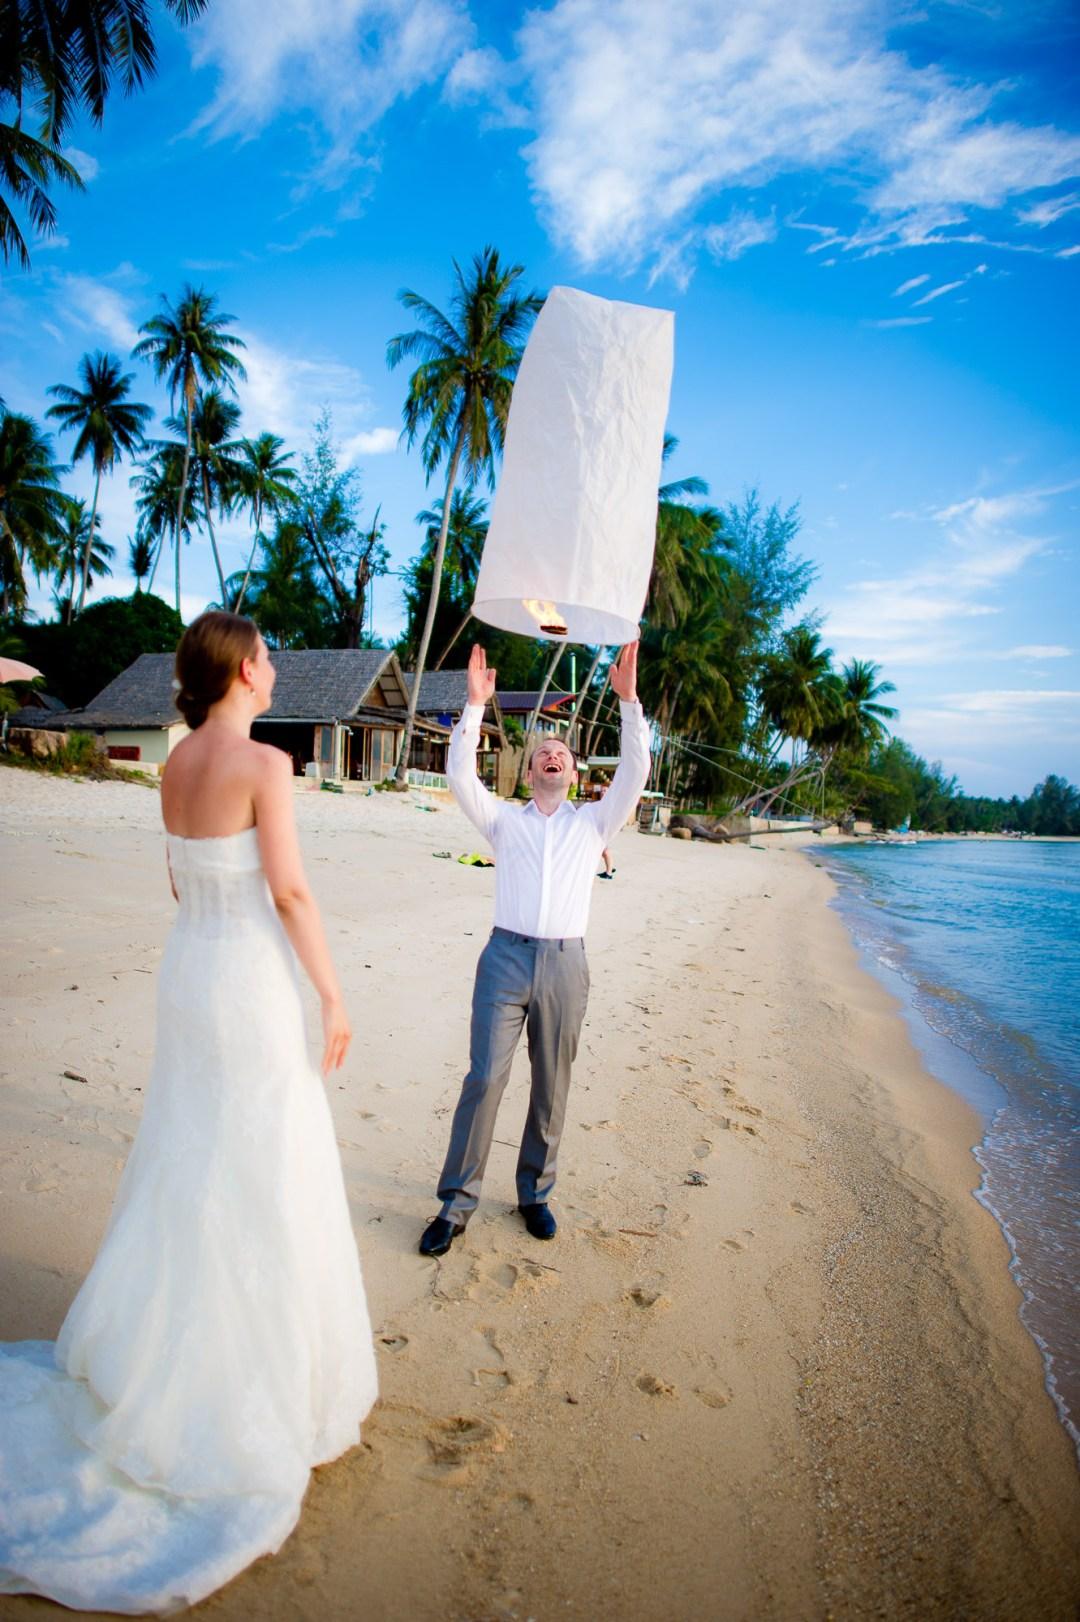 Thailand Wedding Photography | Dreams Villa Resort Koh Samui Wedding